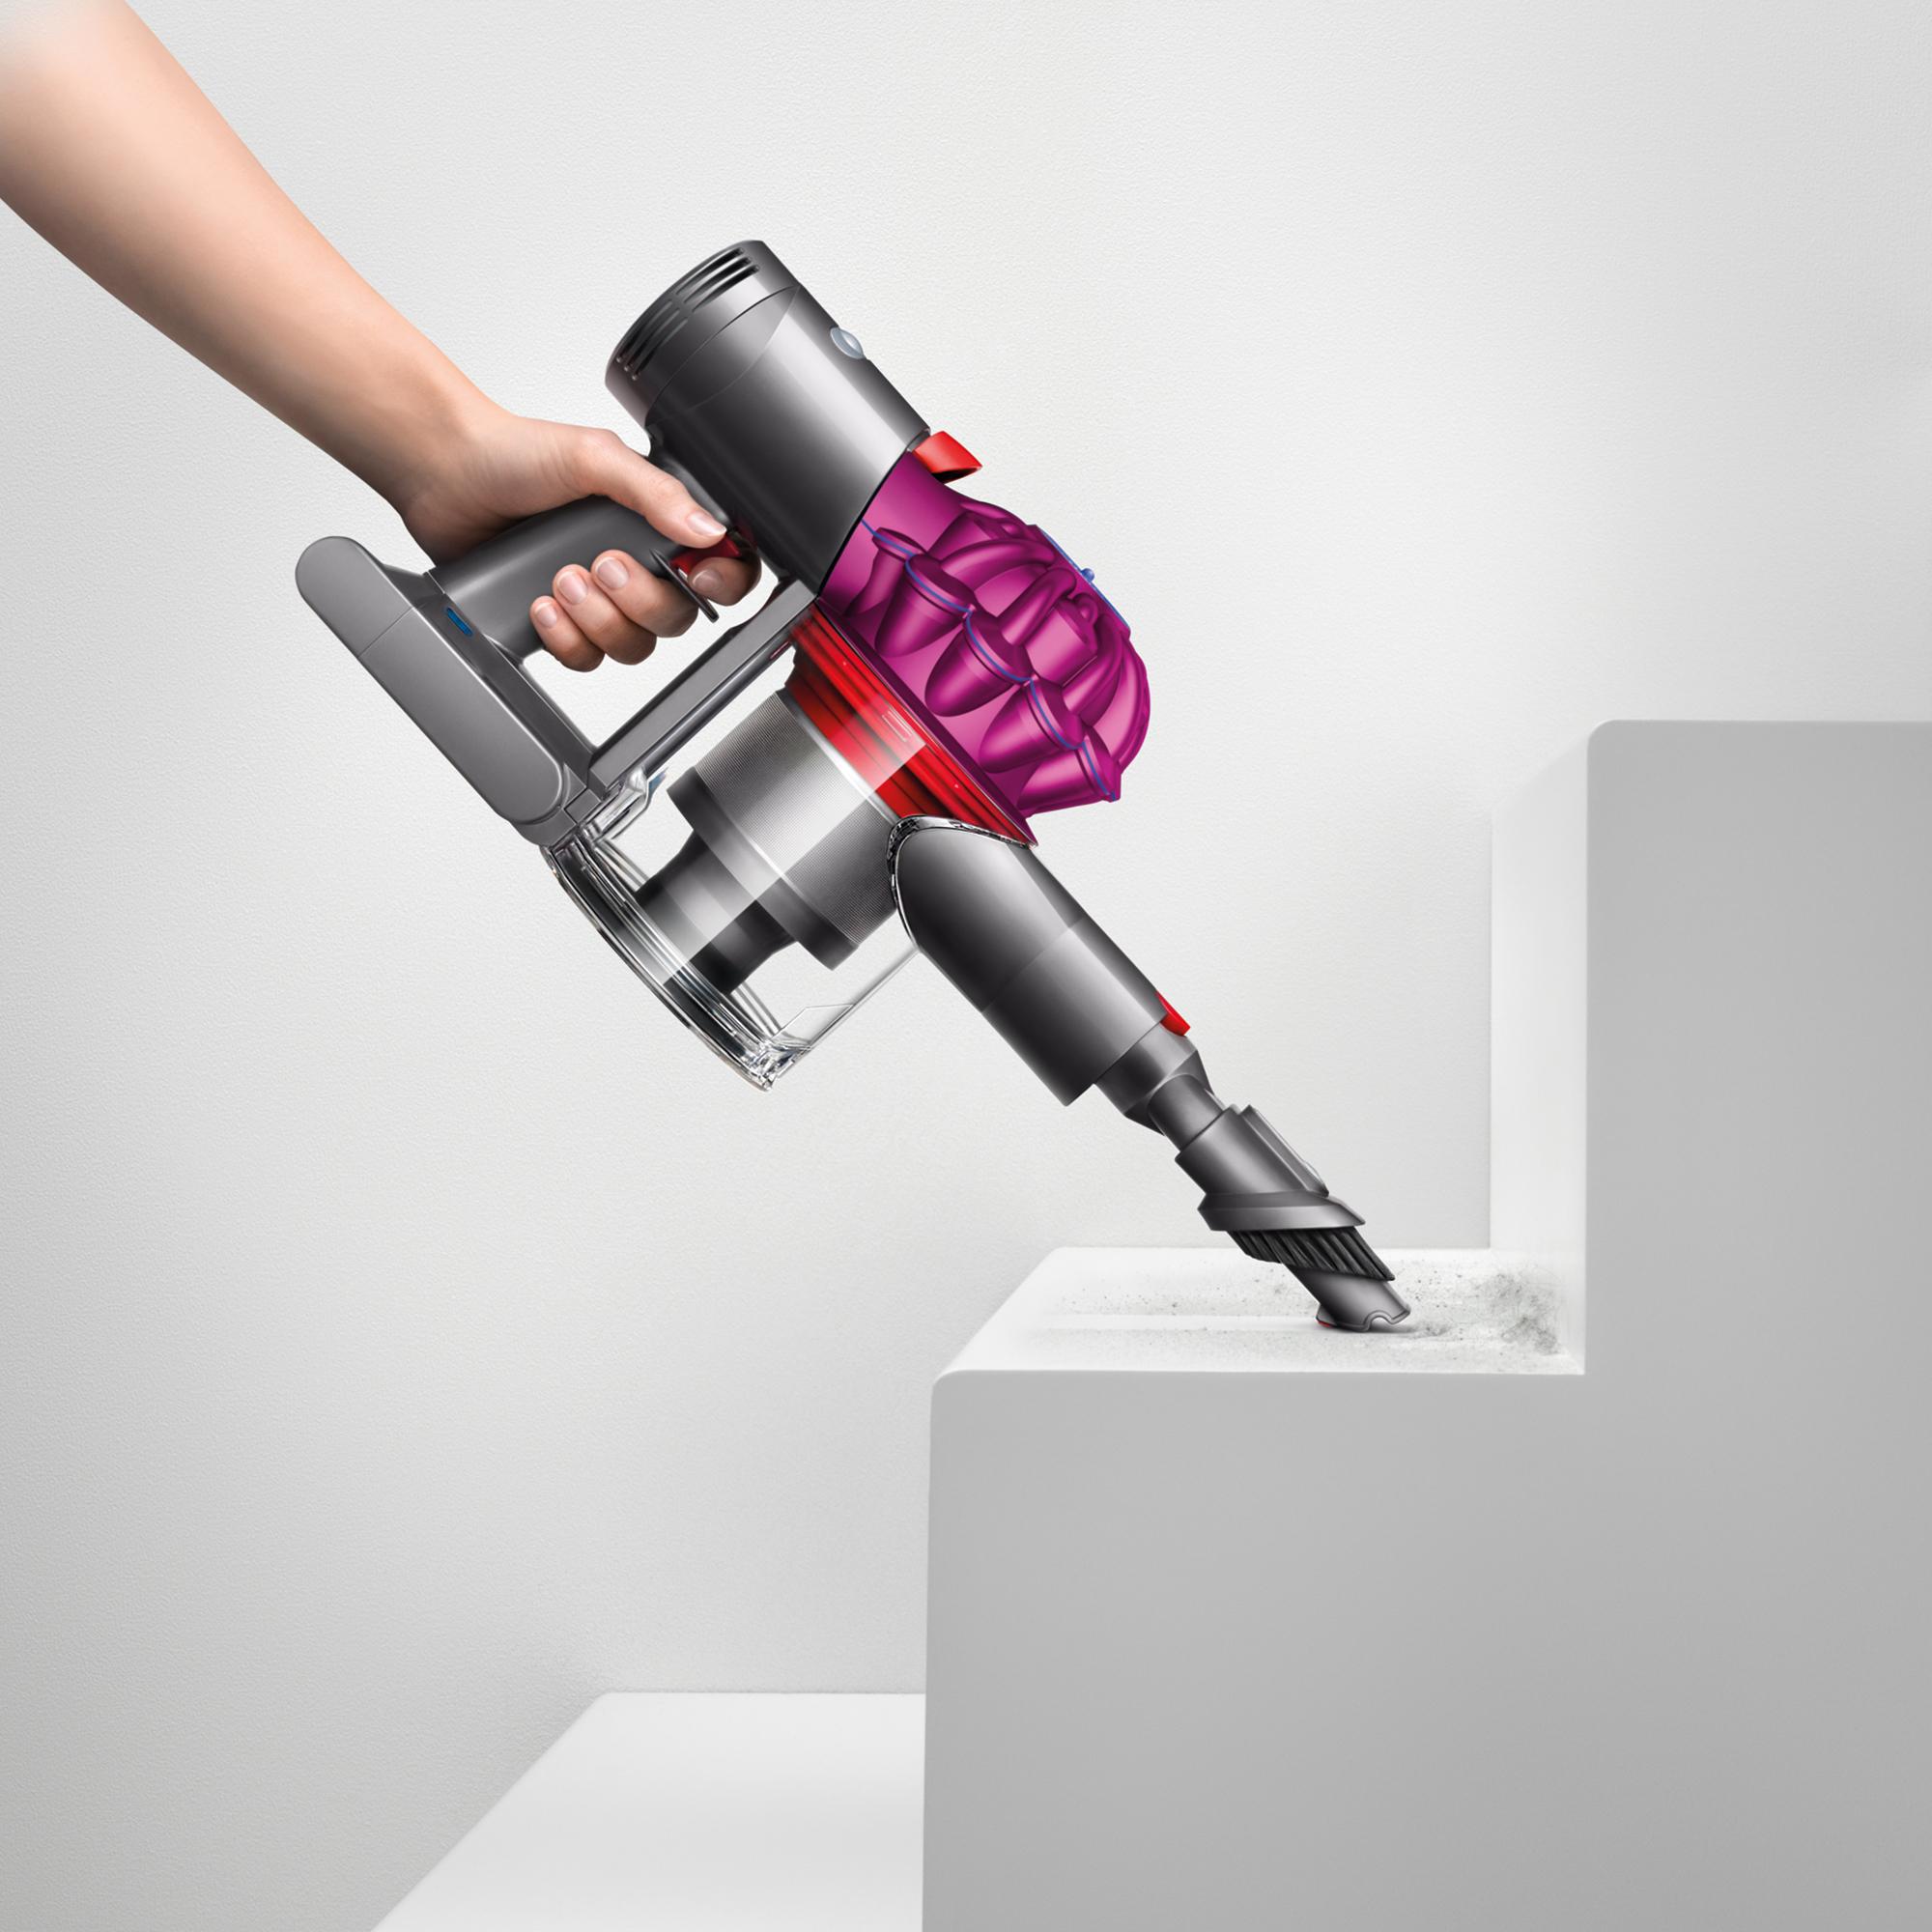 Dyson-V7-Animal-Cordless-HEPA-Vacuum-with-Bonus-Tools-New thumbnail 14